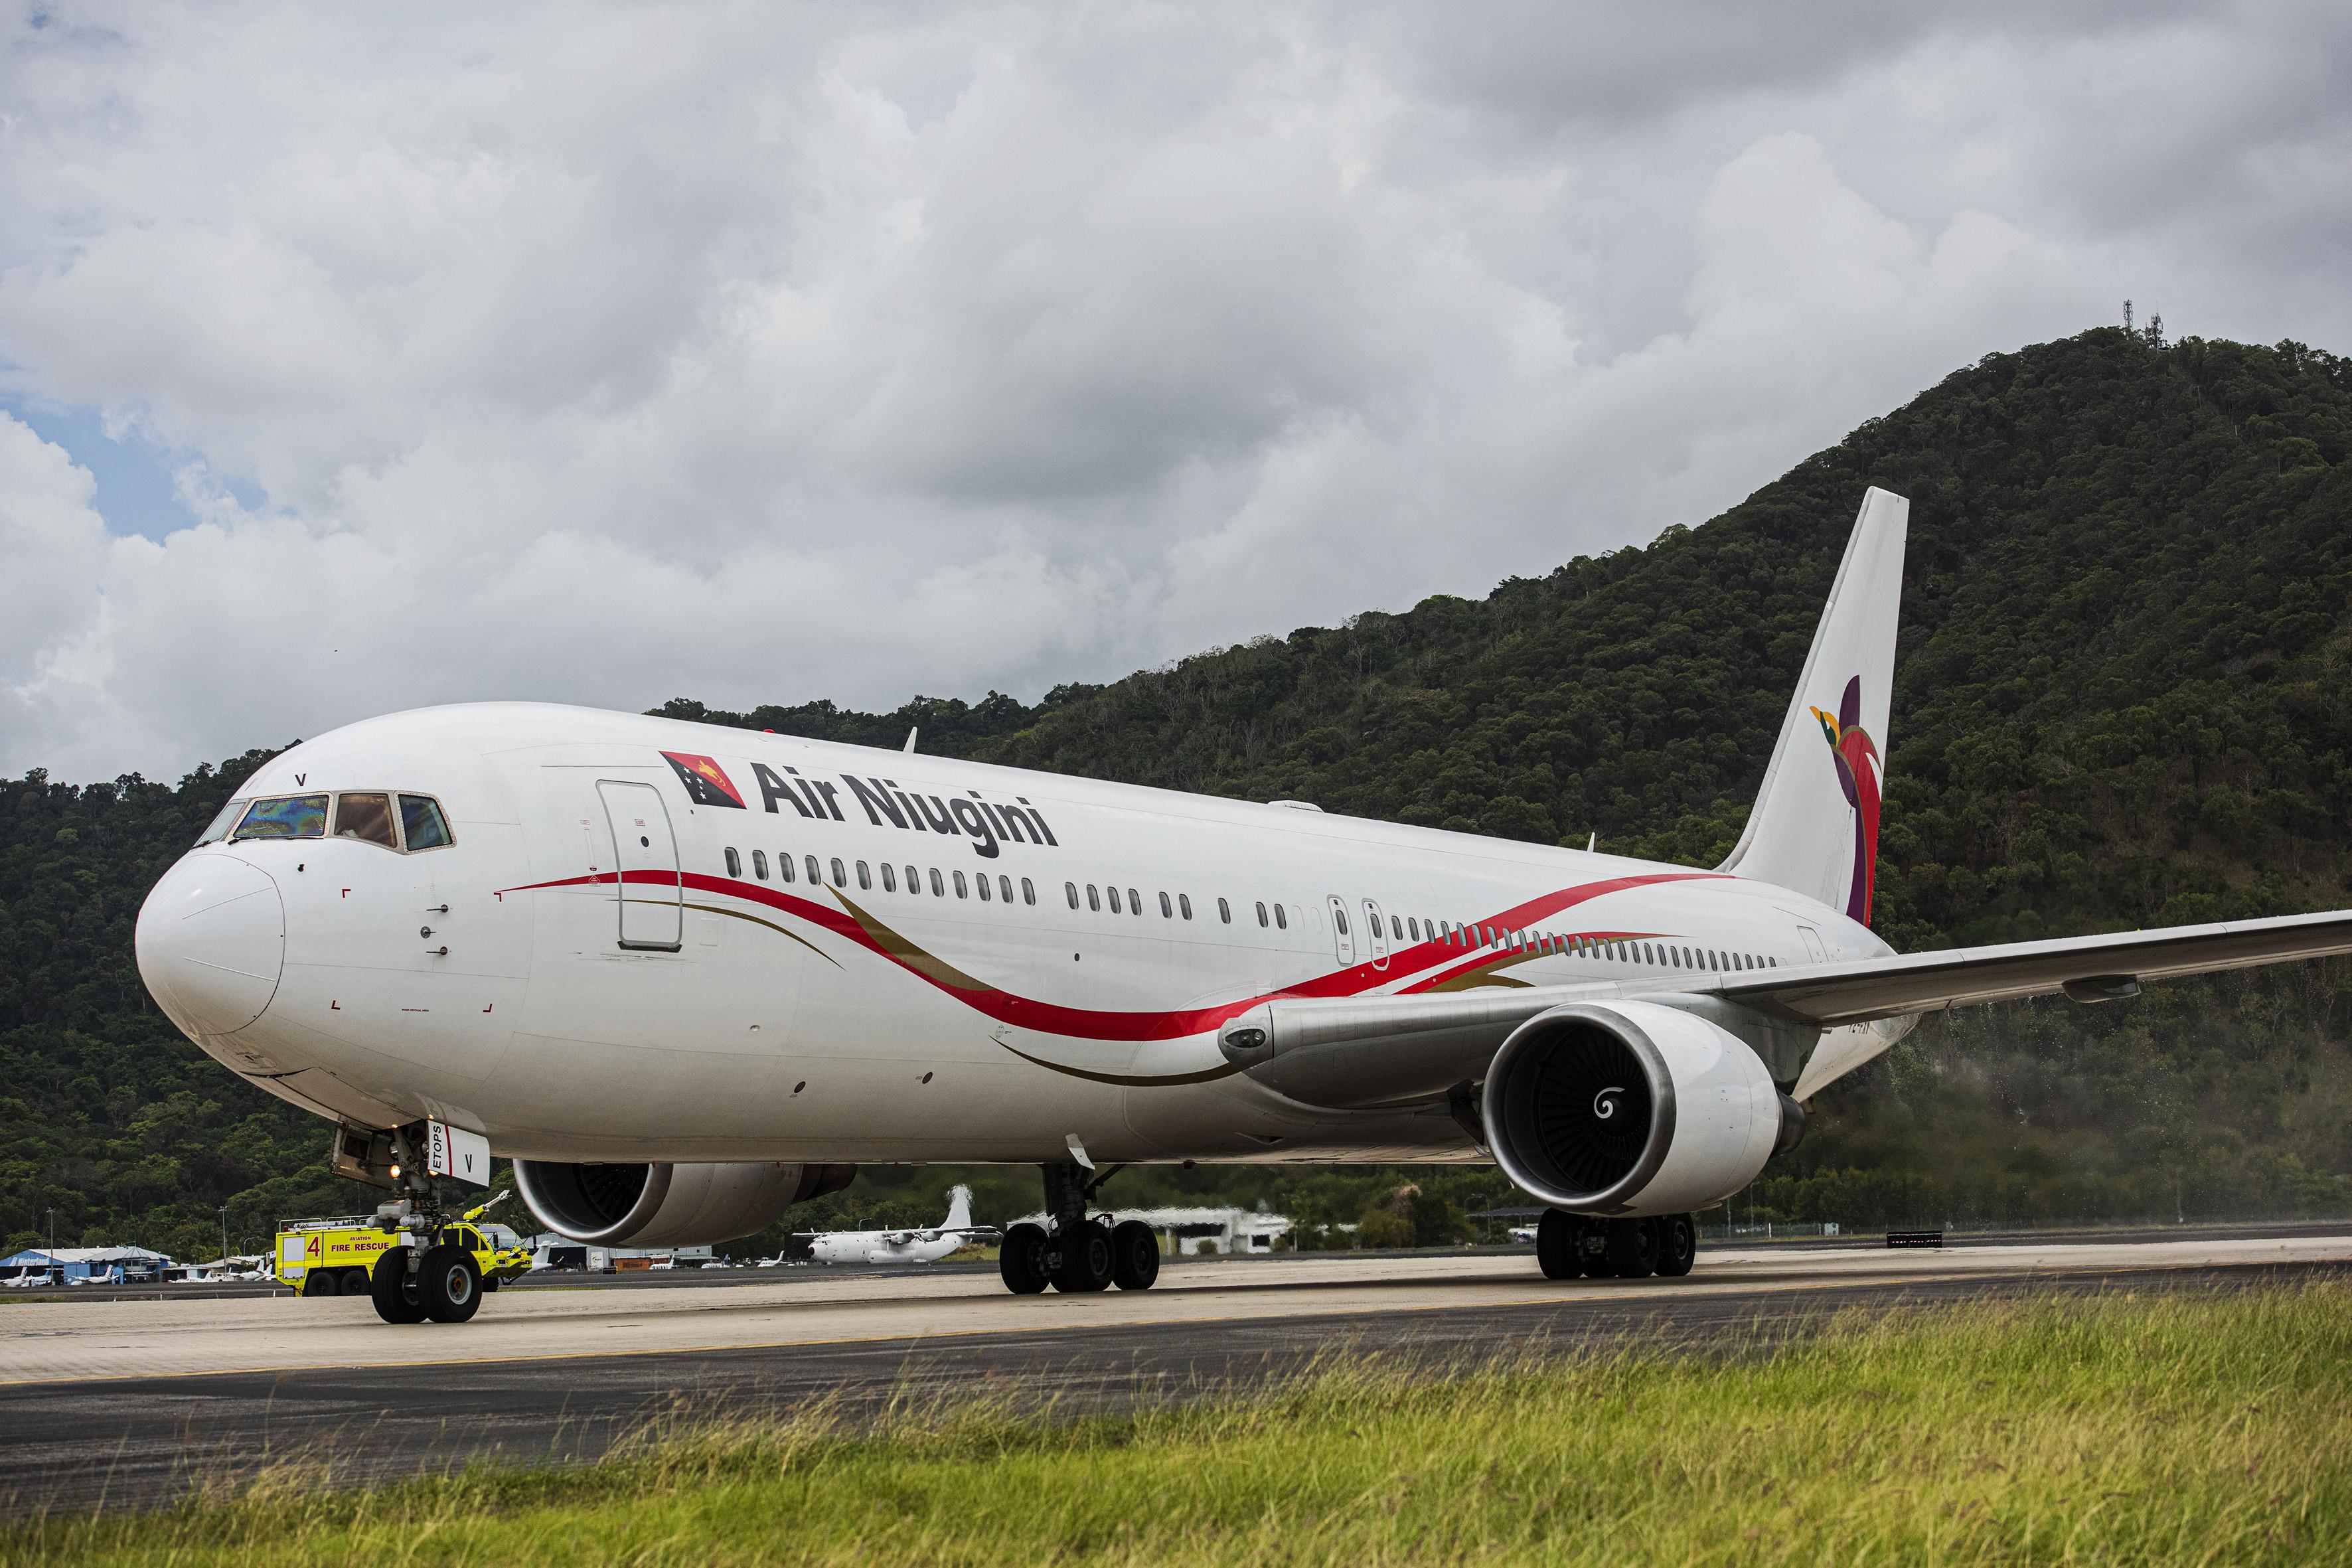 Air Niugini's Inaugural Cairns/Pom/Hong Kong Flight